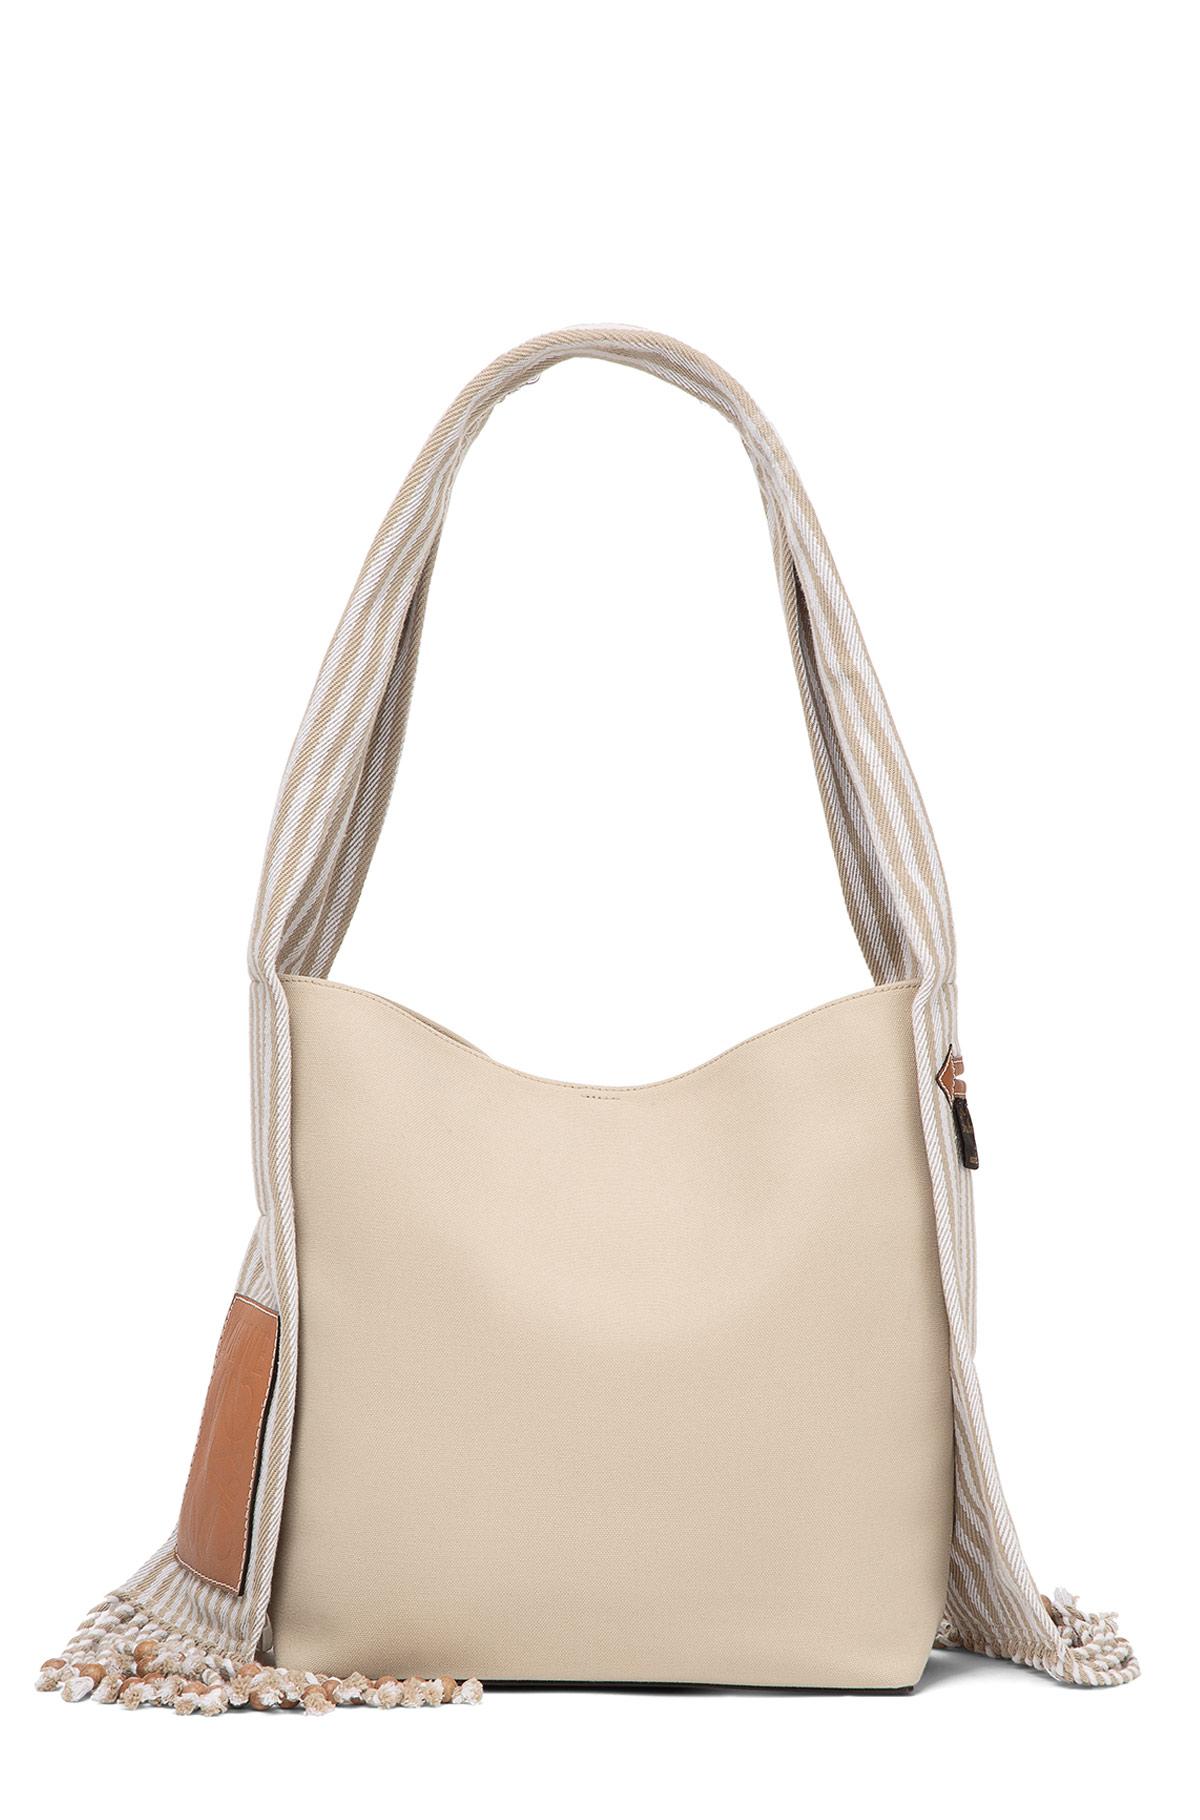 LOEWE Bucket Scarf Bag Natural/Tan front